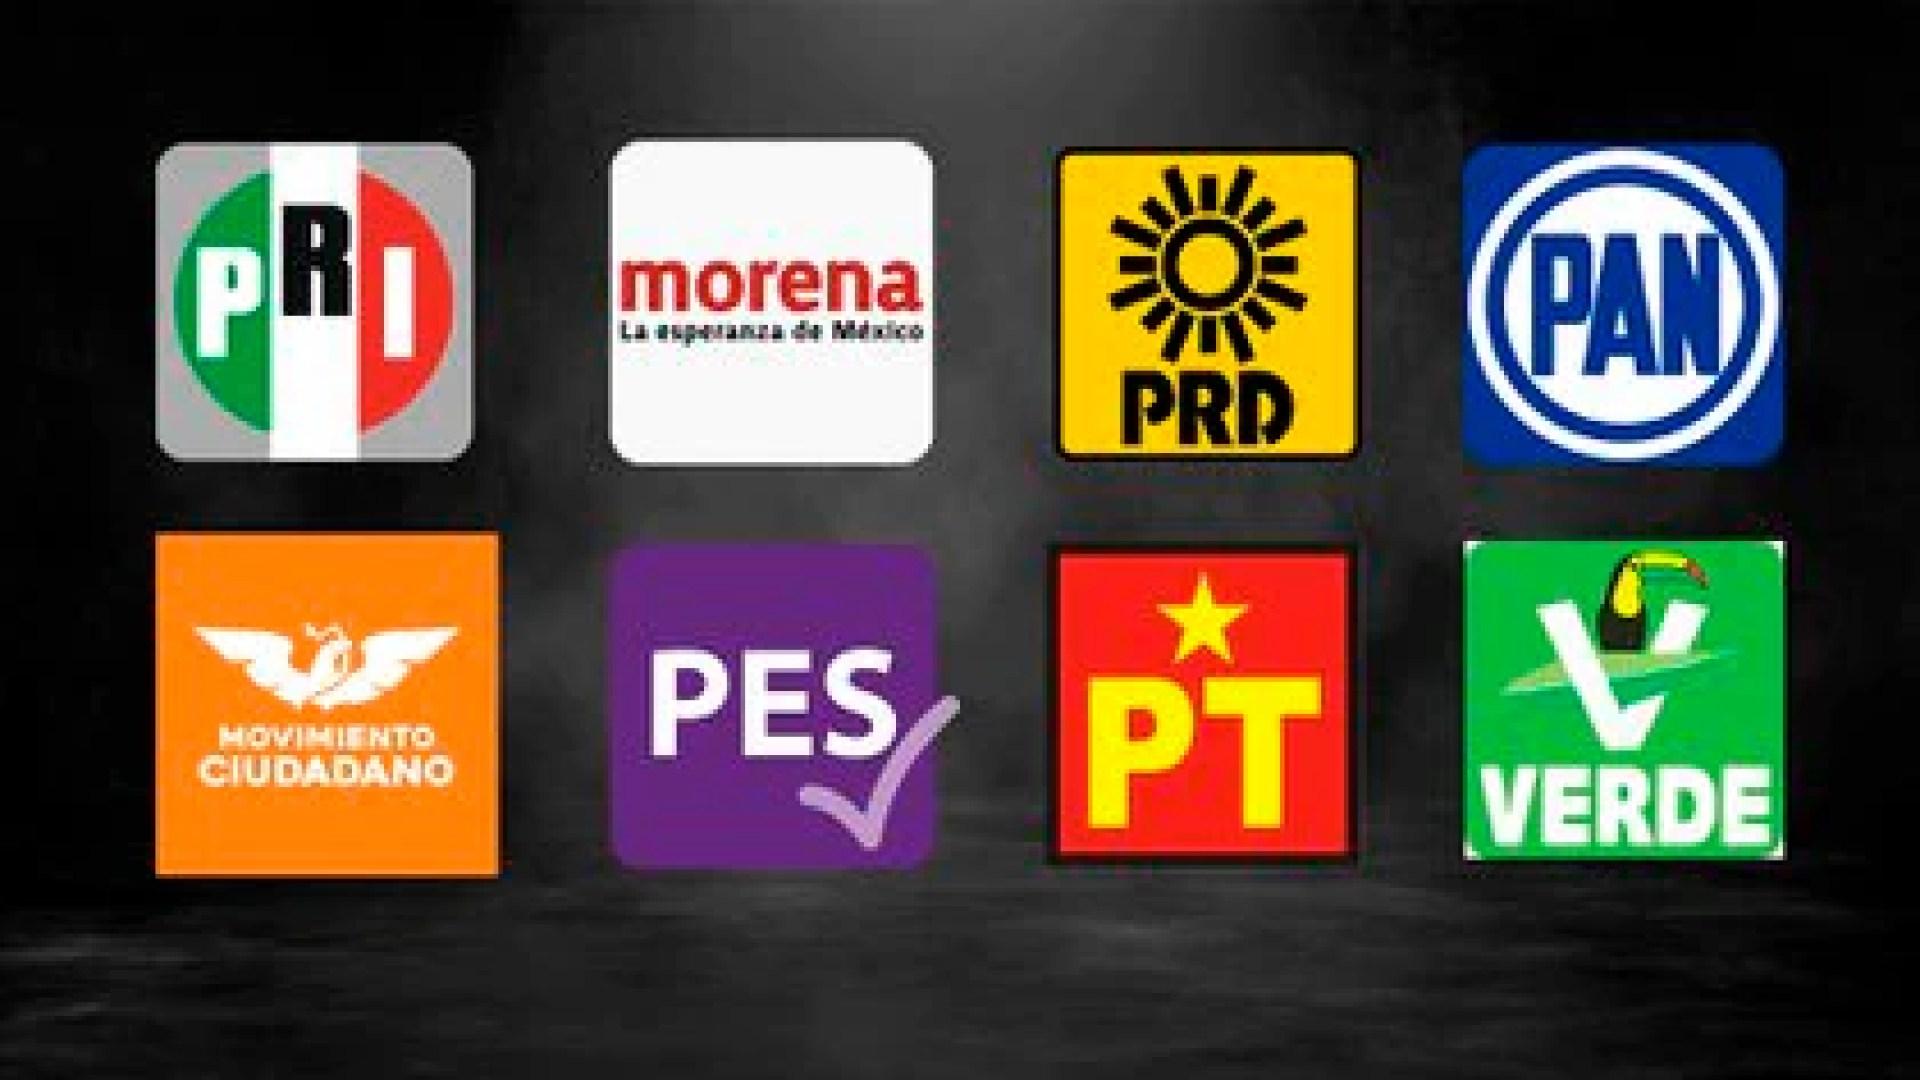 The political parties defeated in 2018 joined Sí por México (Photo: Steve Allen)